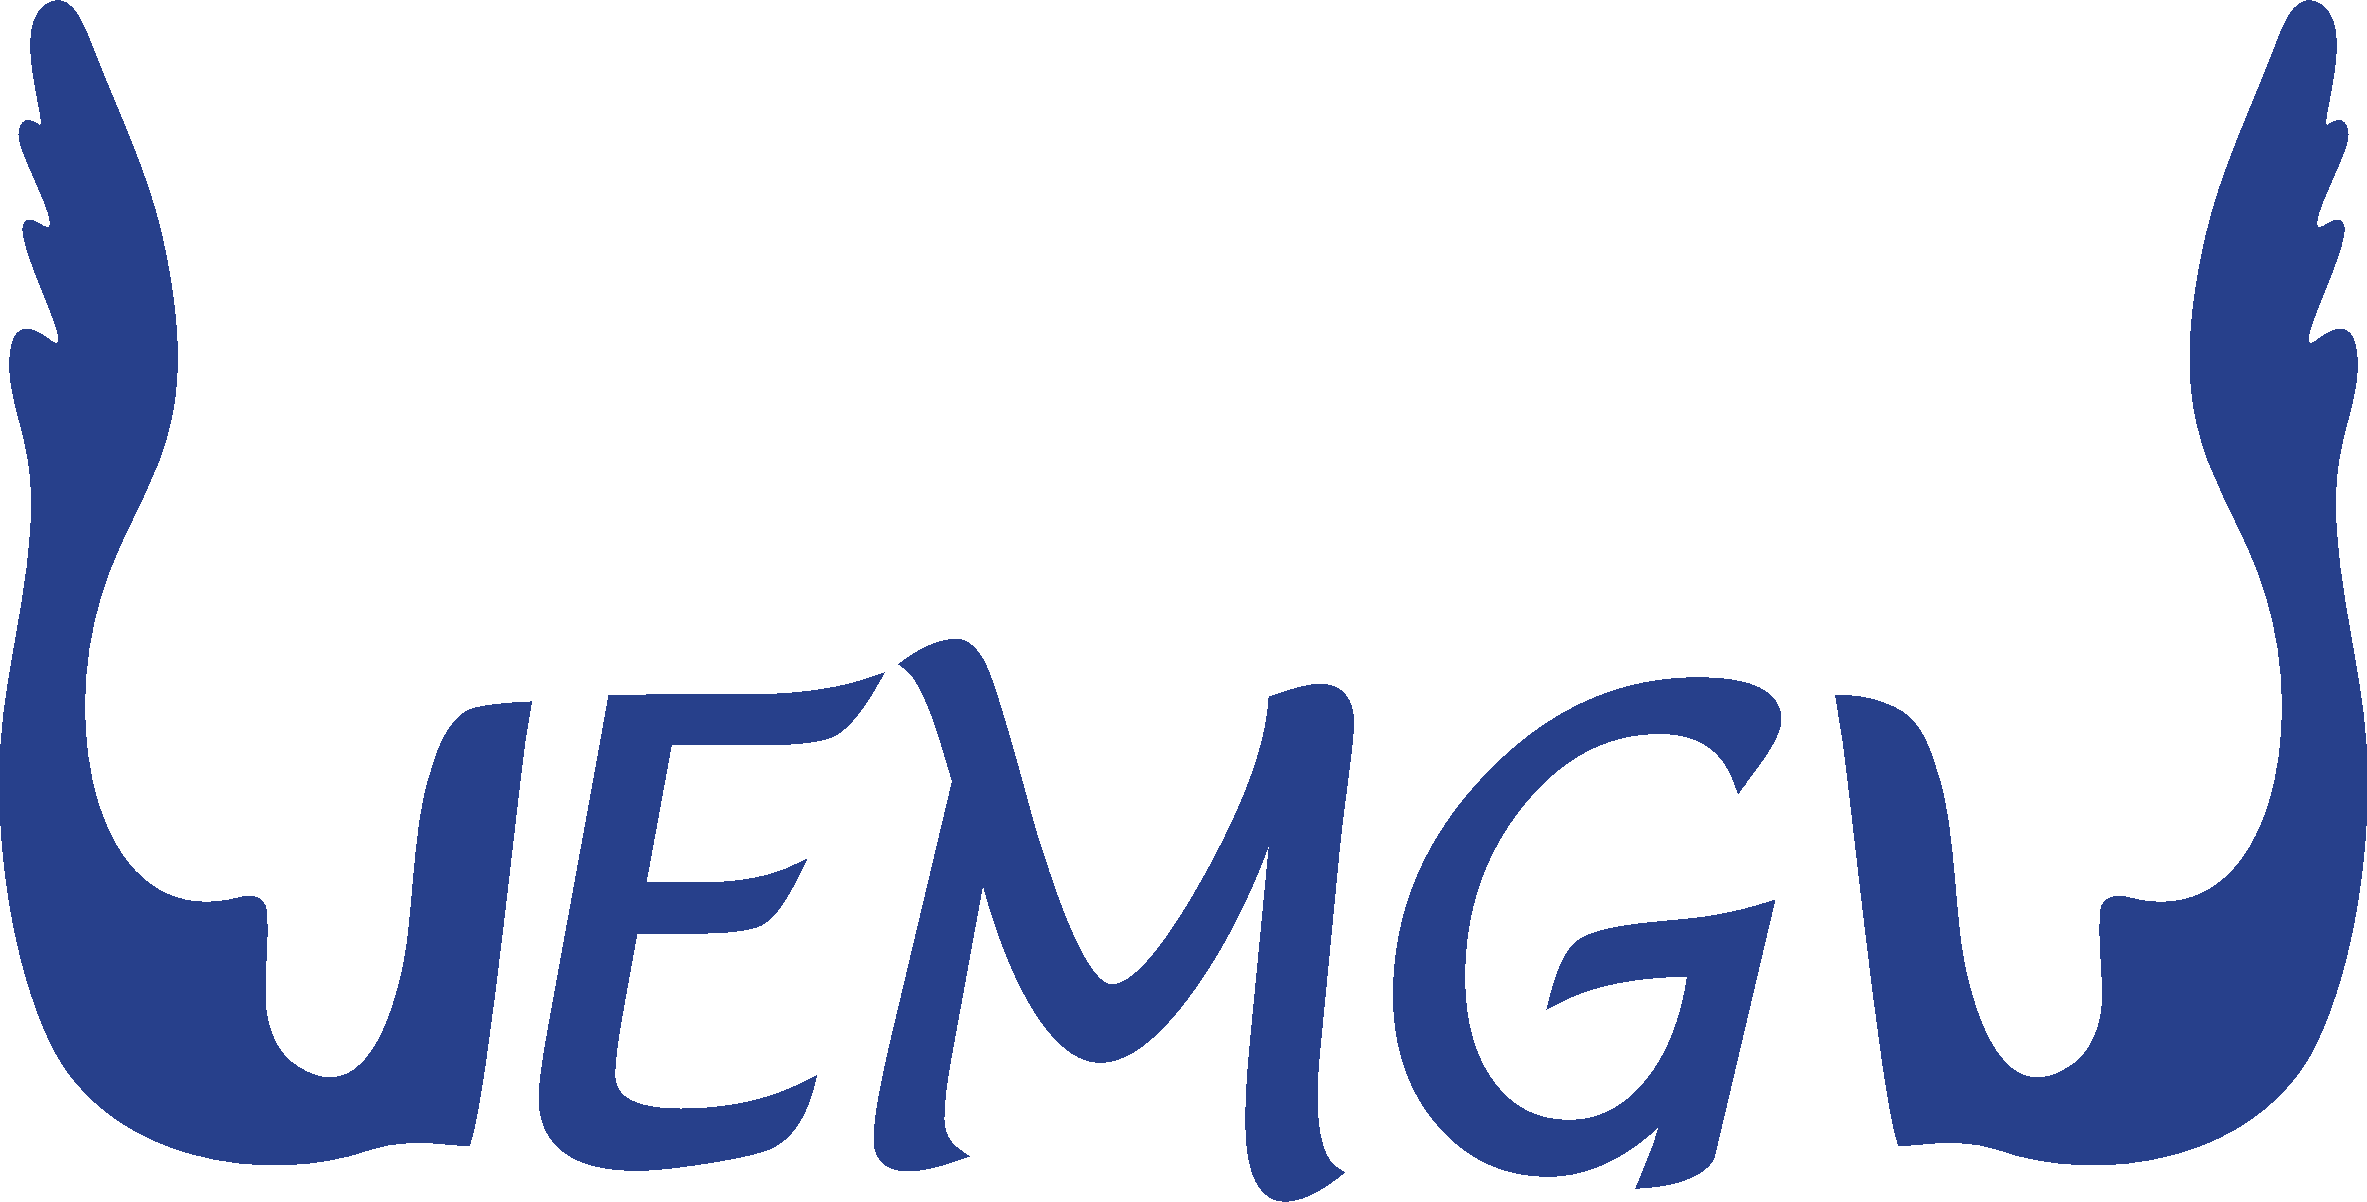 Elke M. Geenen (EMG Logo)